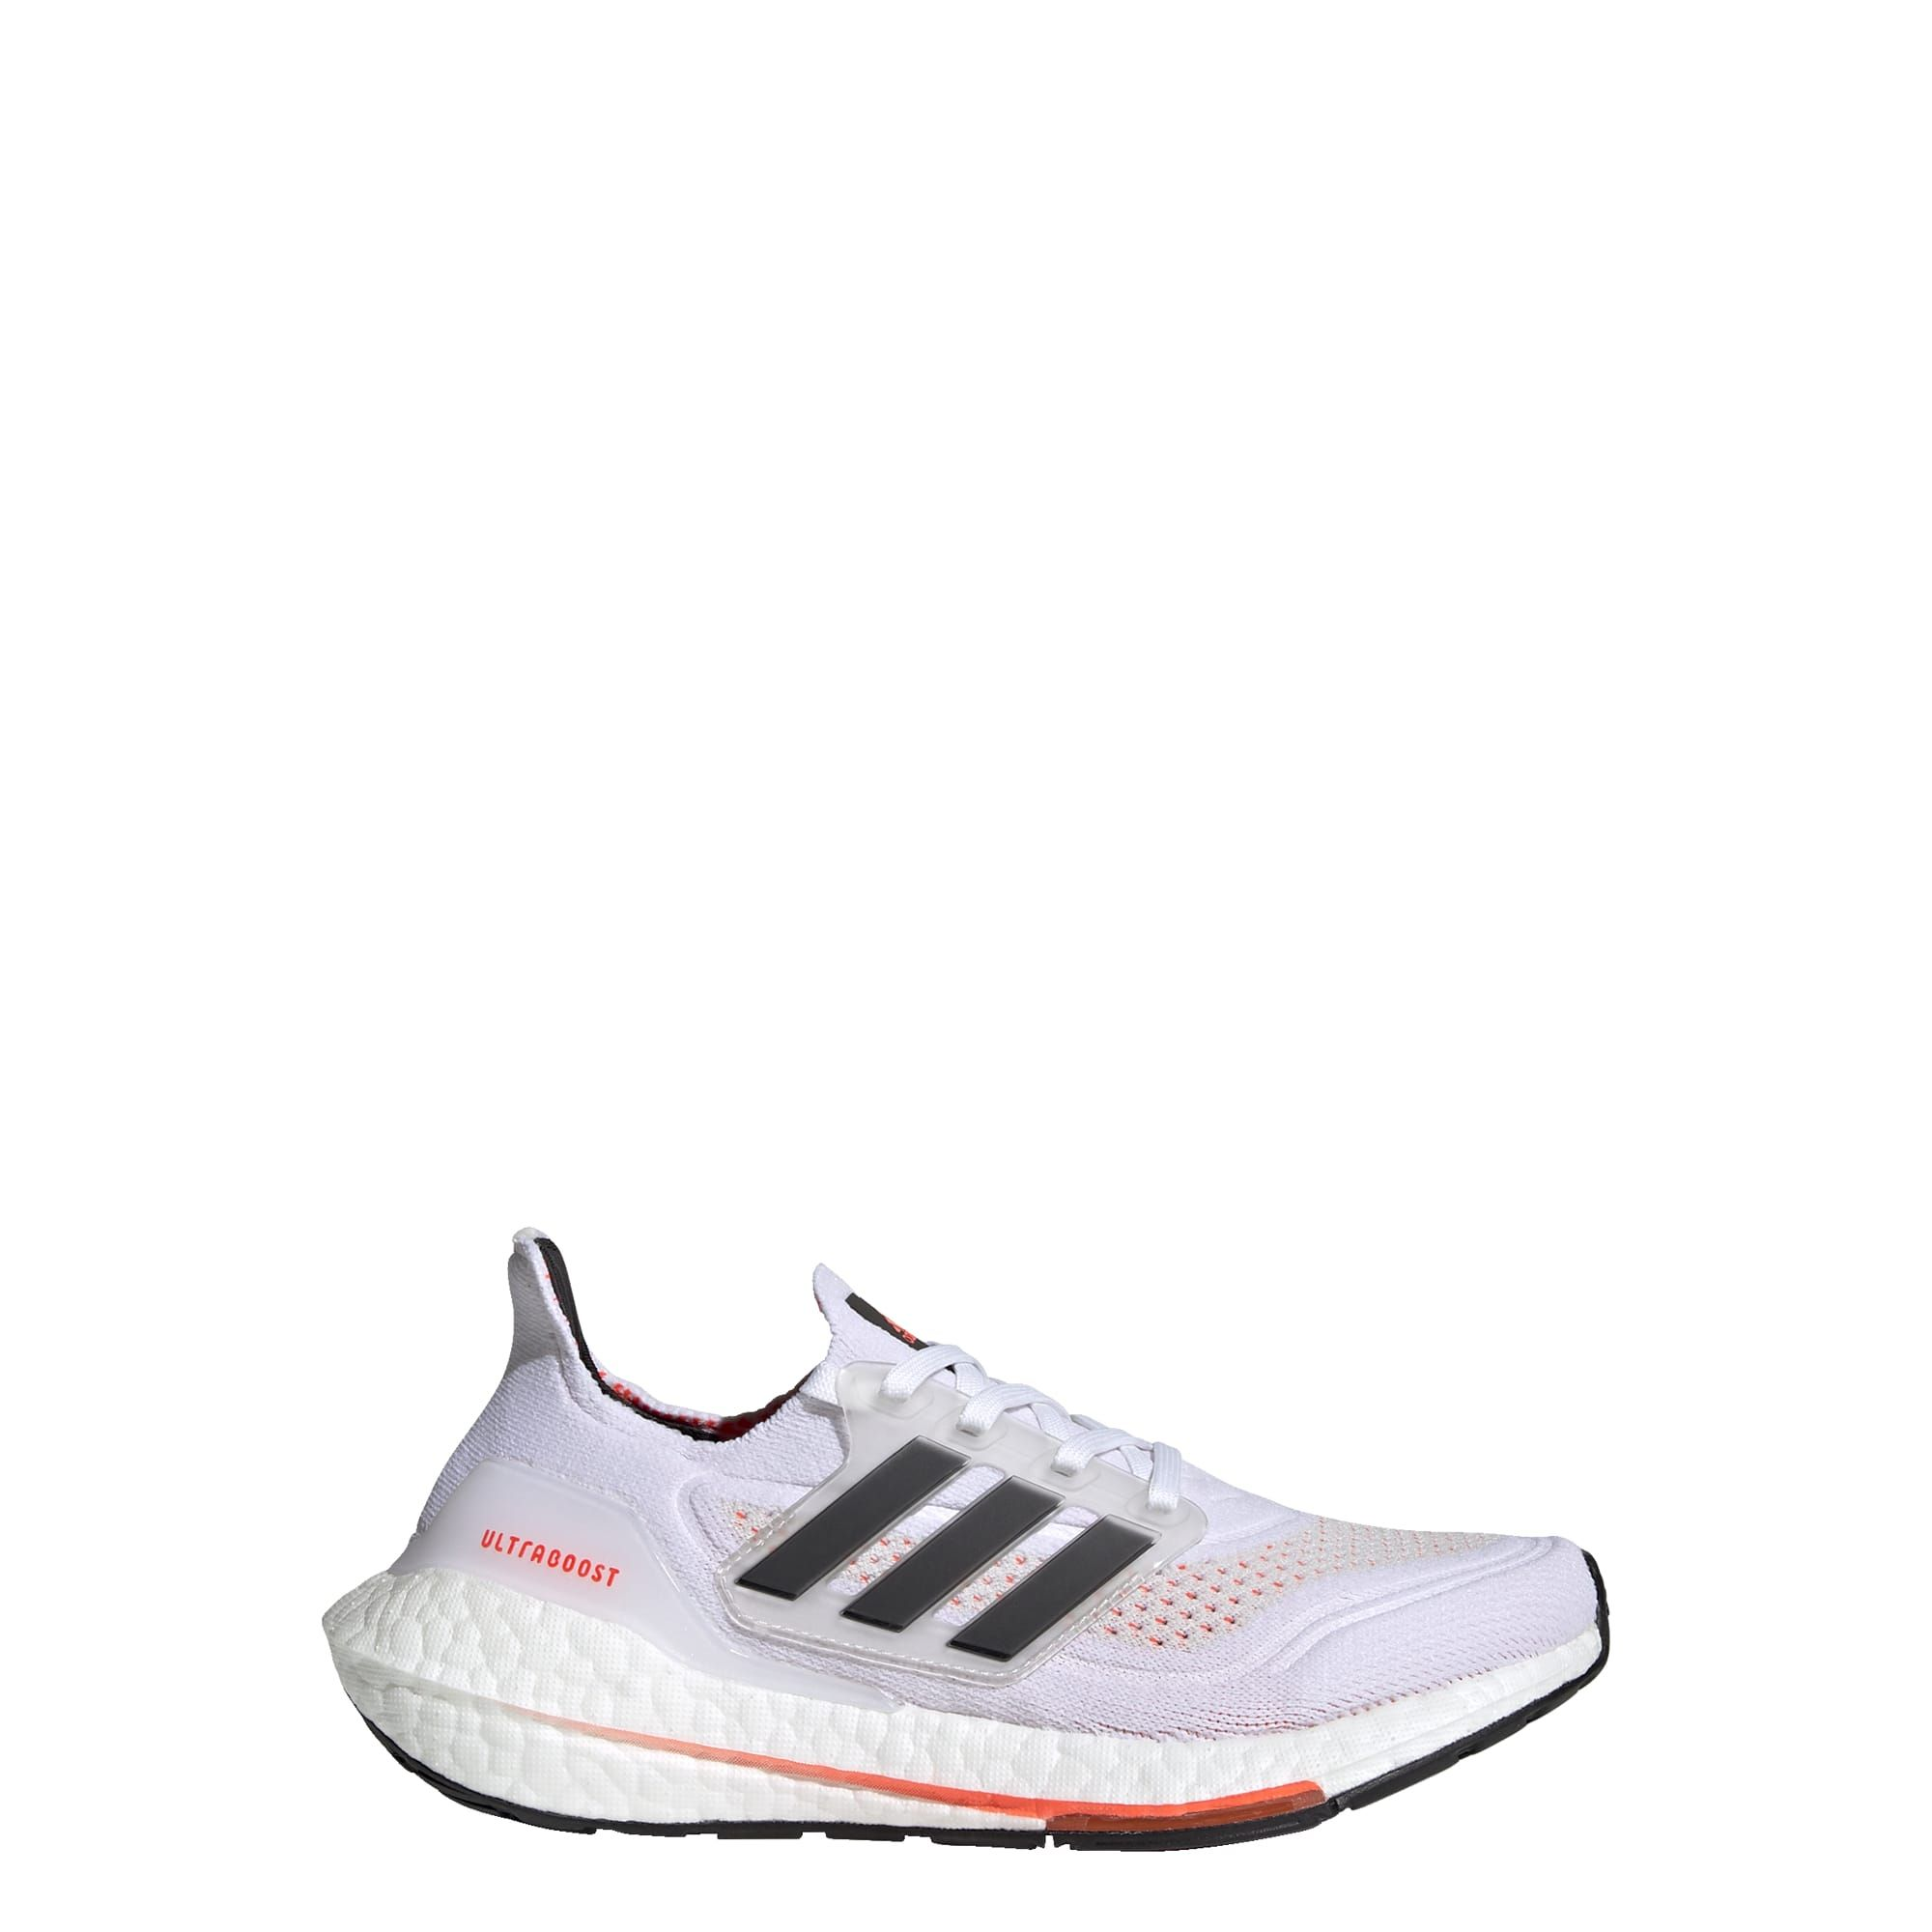 adidas Ultraboost 21 Primeblue Boost Hardloopschoenen Kids Wit Zwart Rood